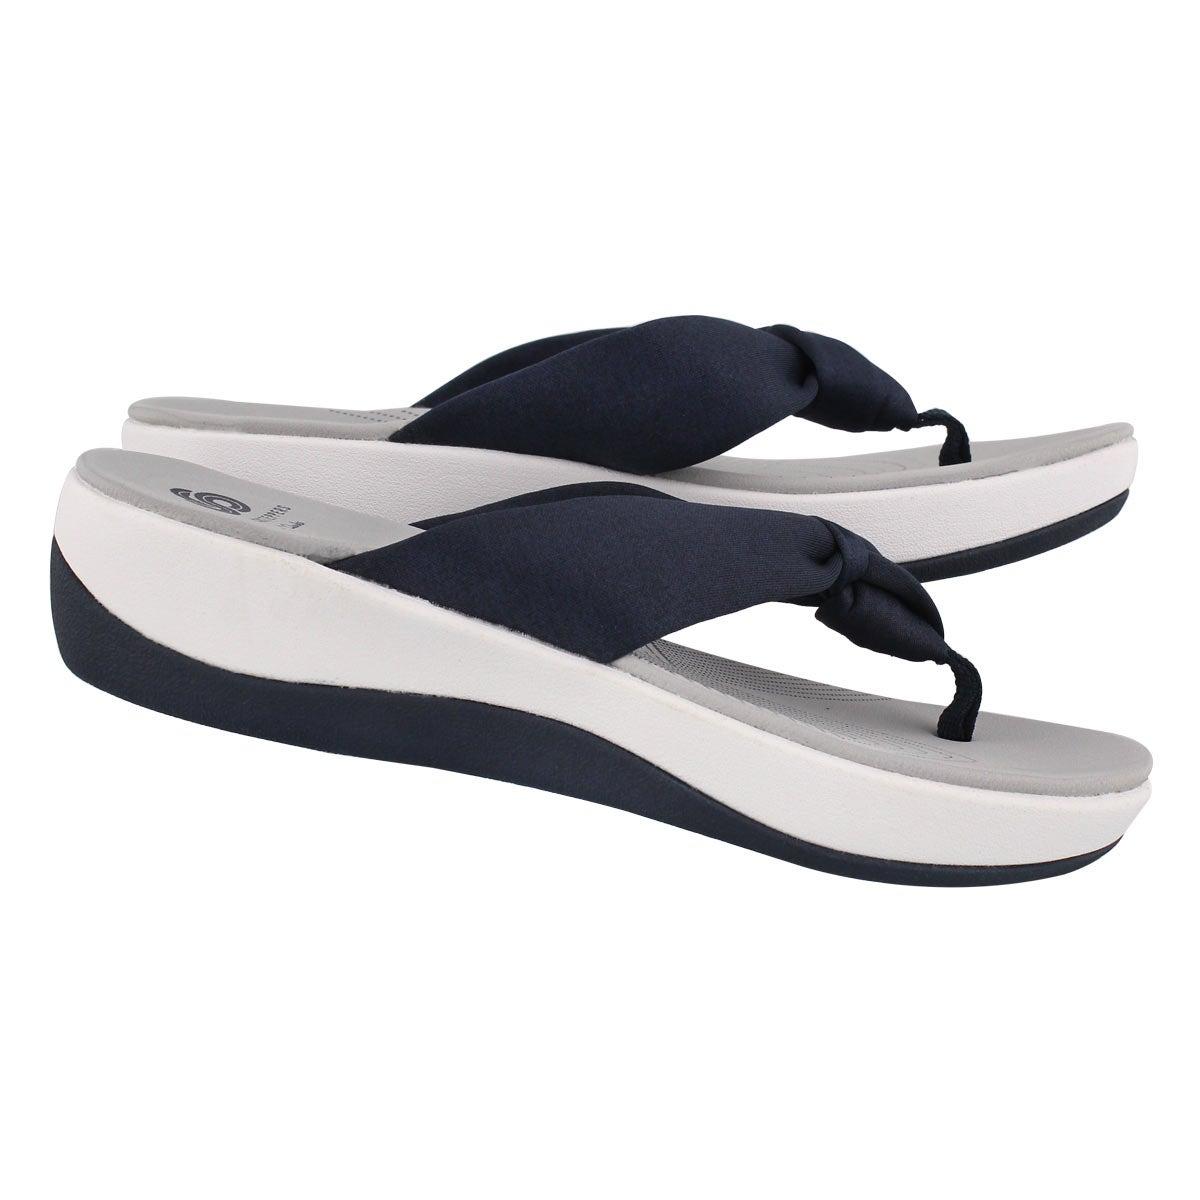 Lds Arla Glison blue thong wedge sandal